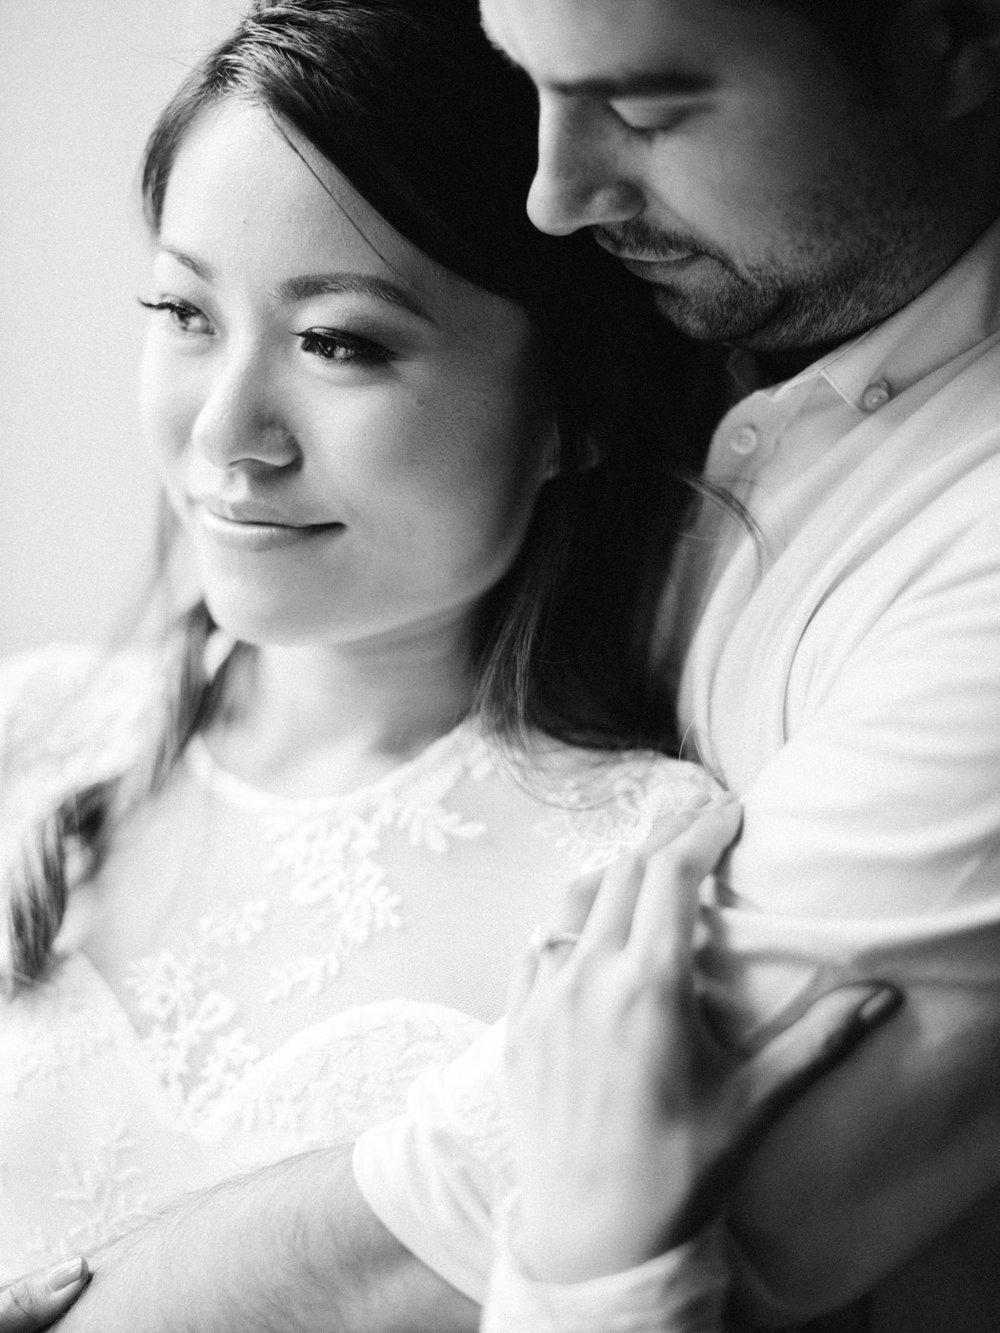 toronto_wedding_photographer_fine_art_documentary_Hamilton_Engagement_McMaster-34.jpg